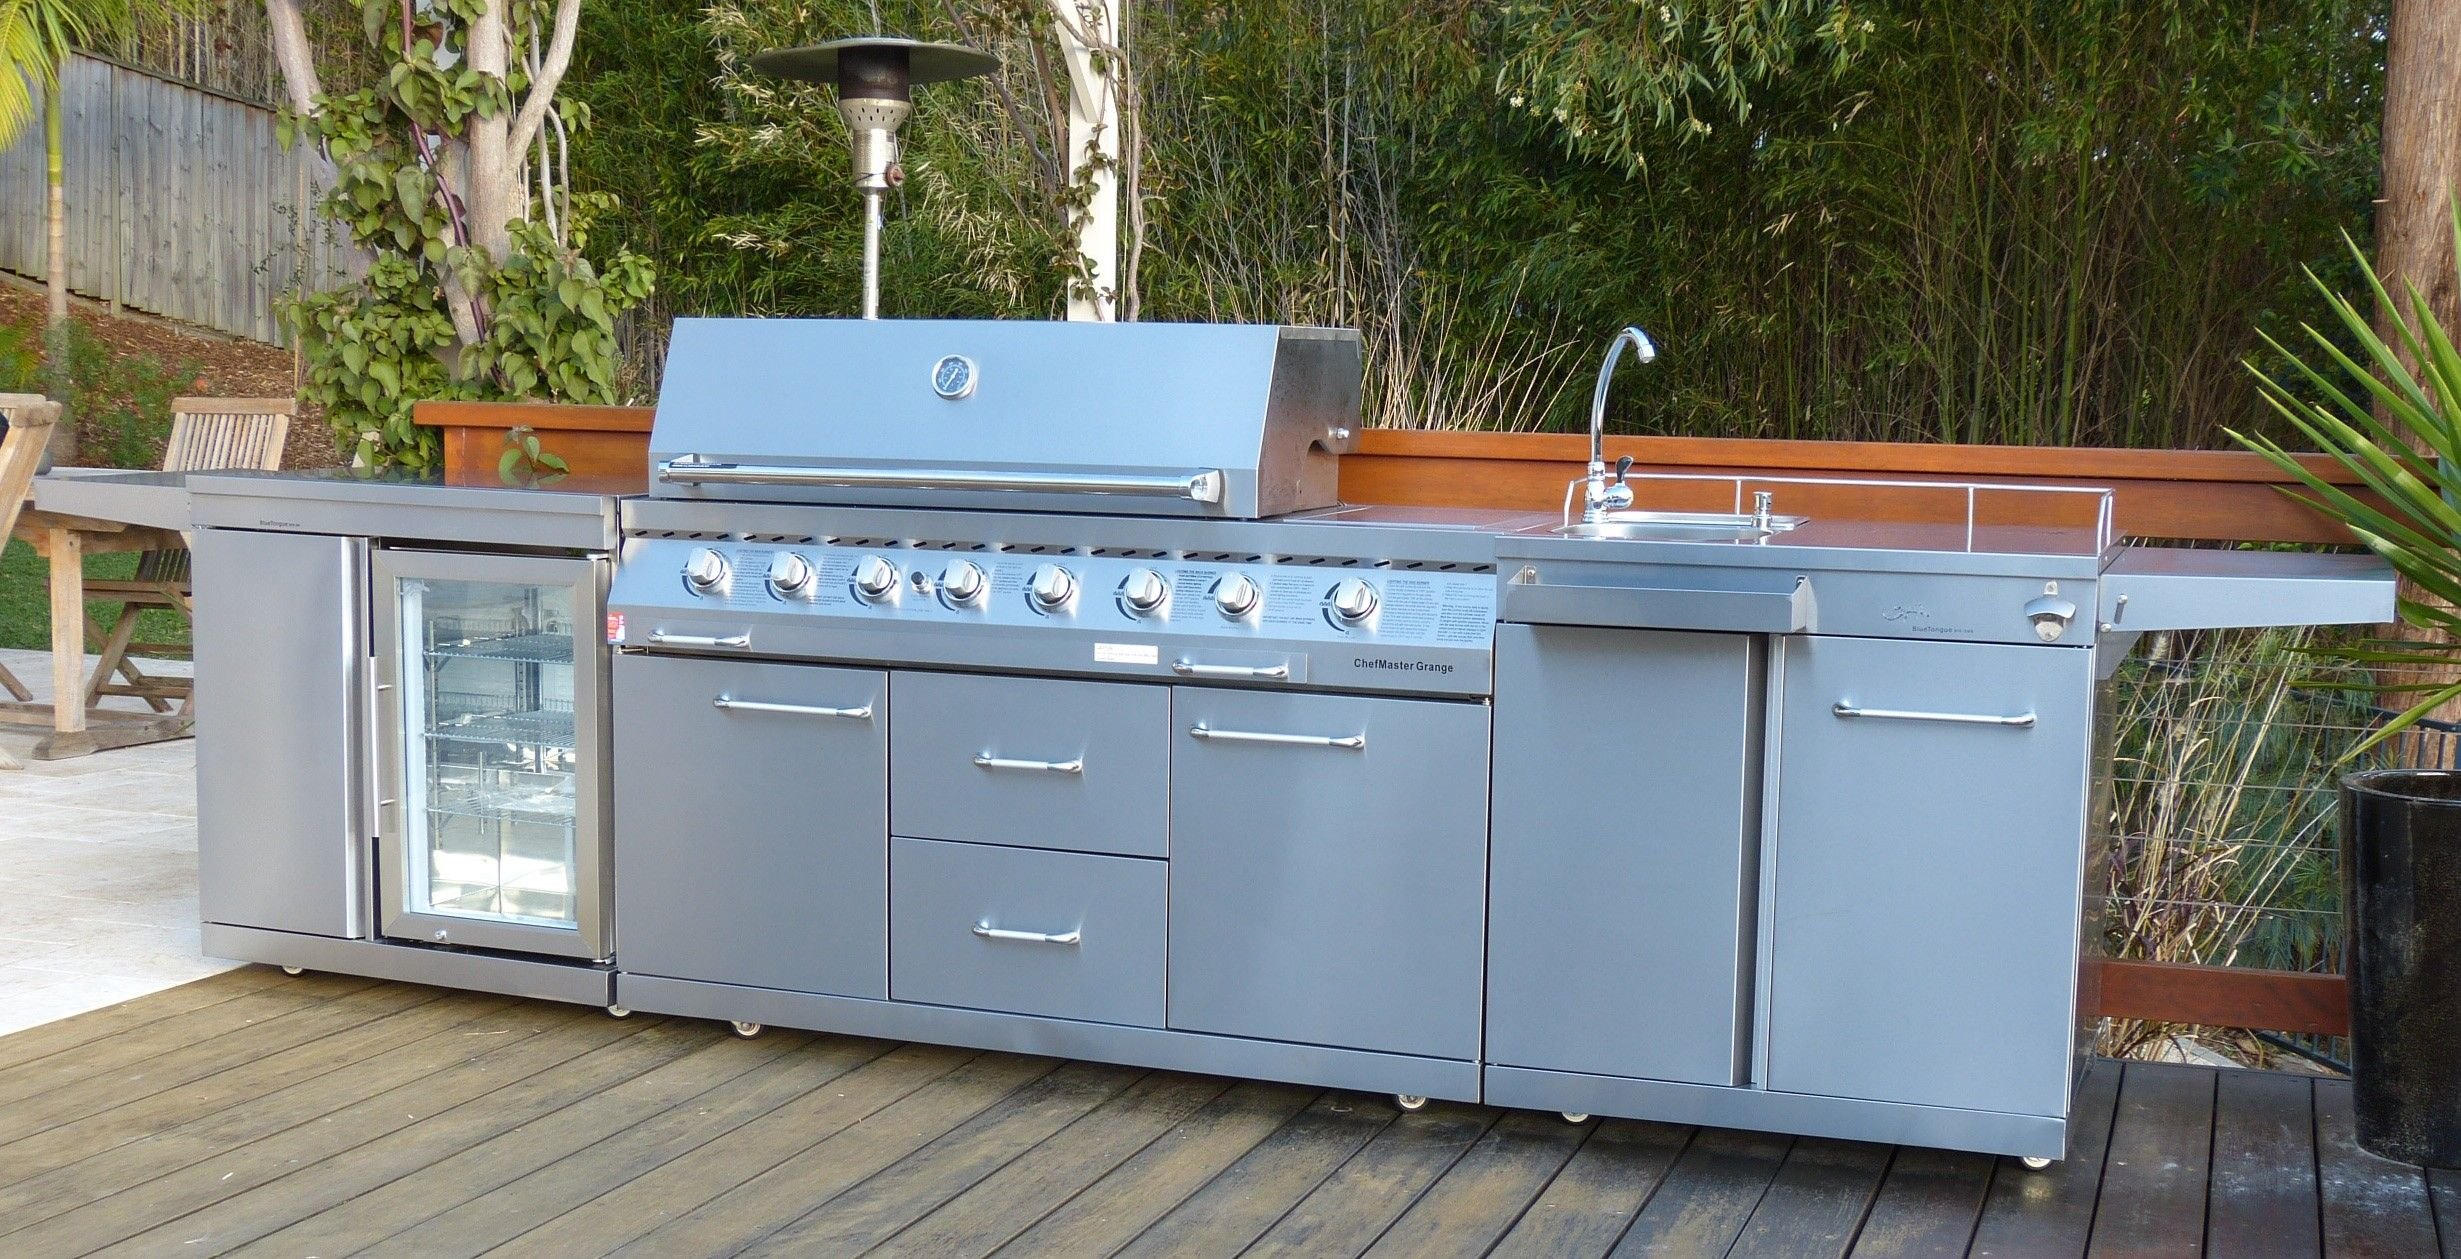 BT8-KR 8 burner BBQ/Fridge/Sink combo outdoor kitchen - wow ...